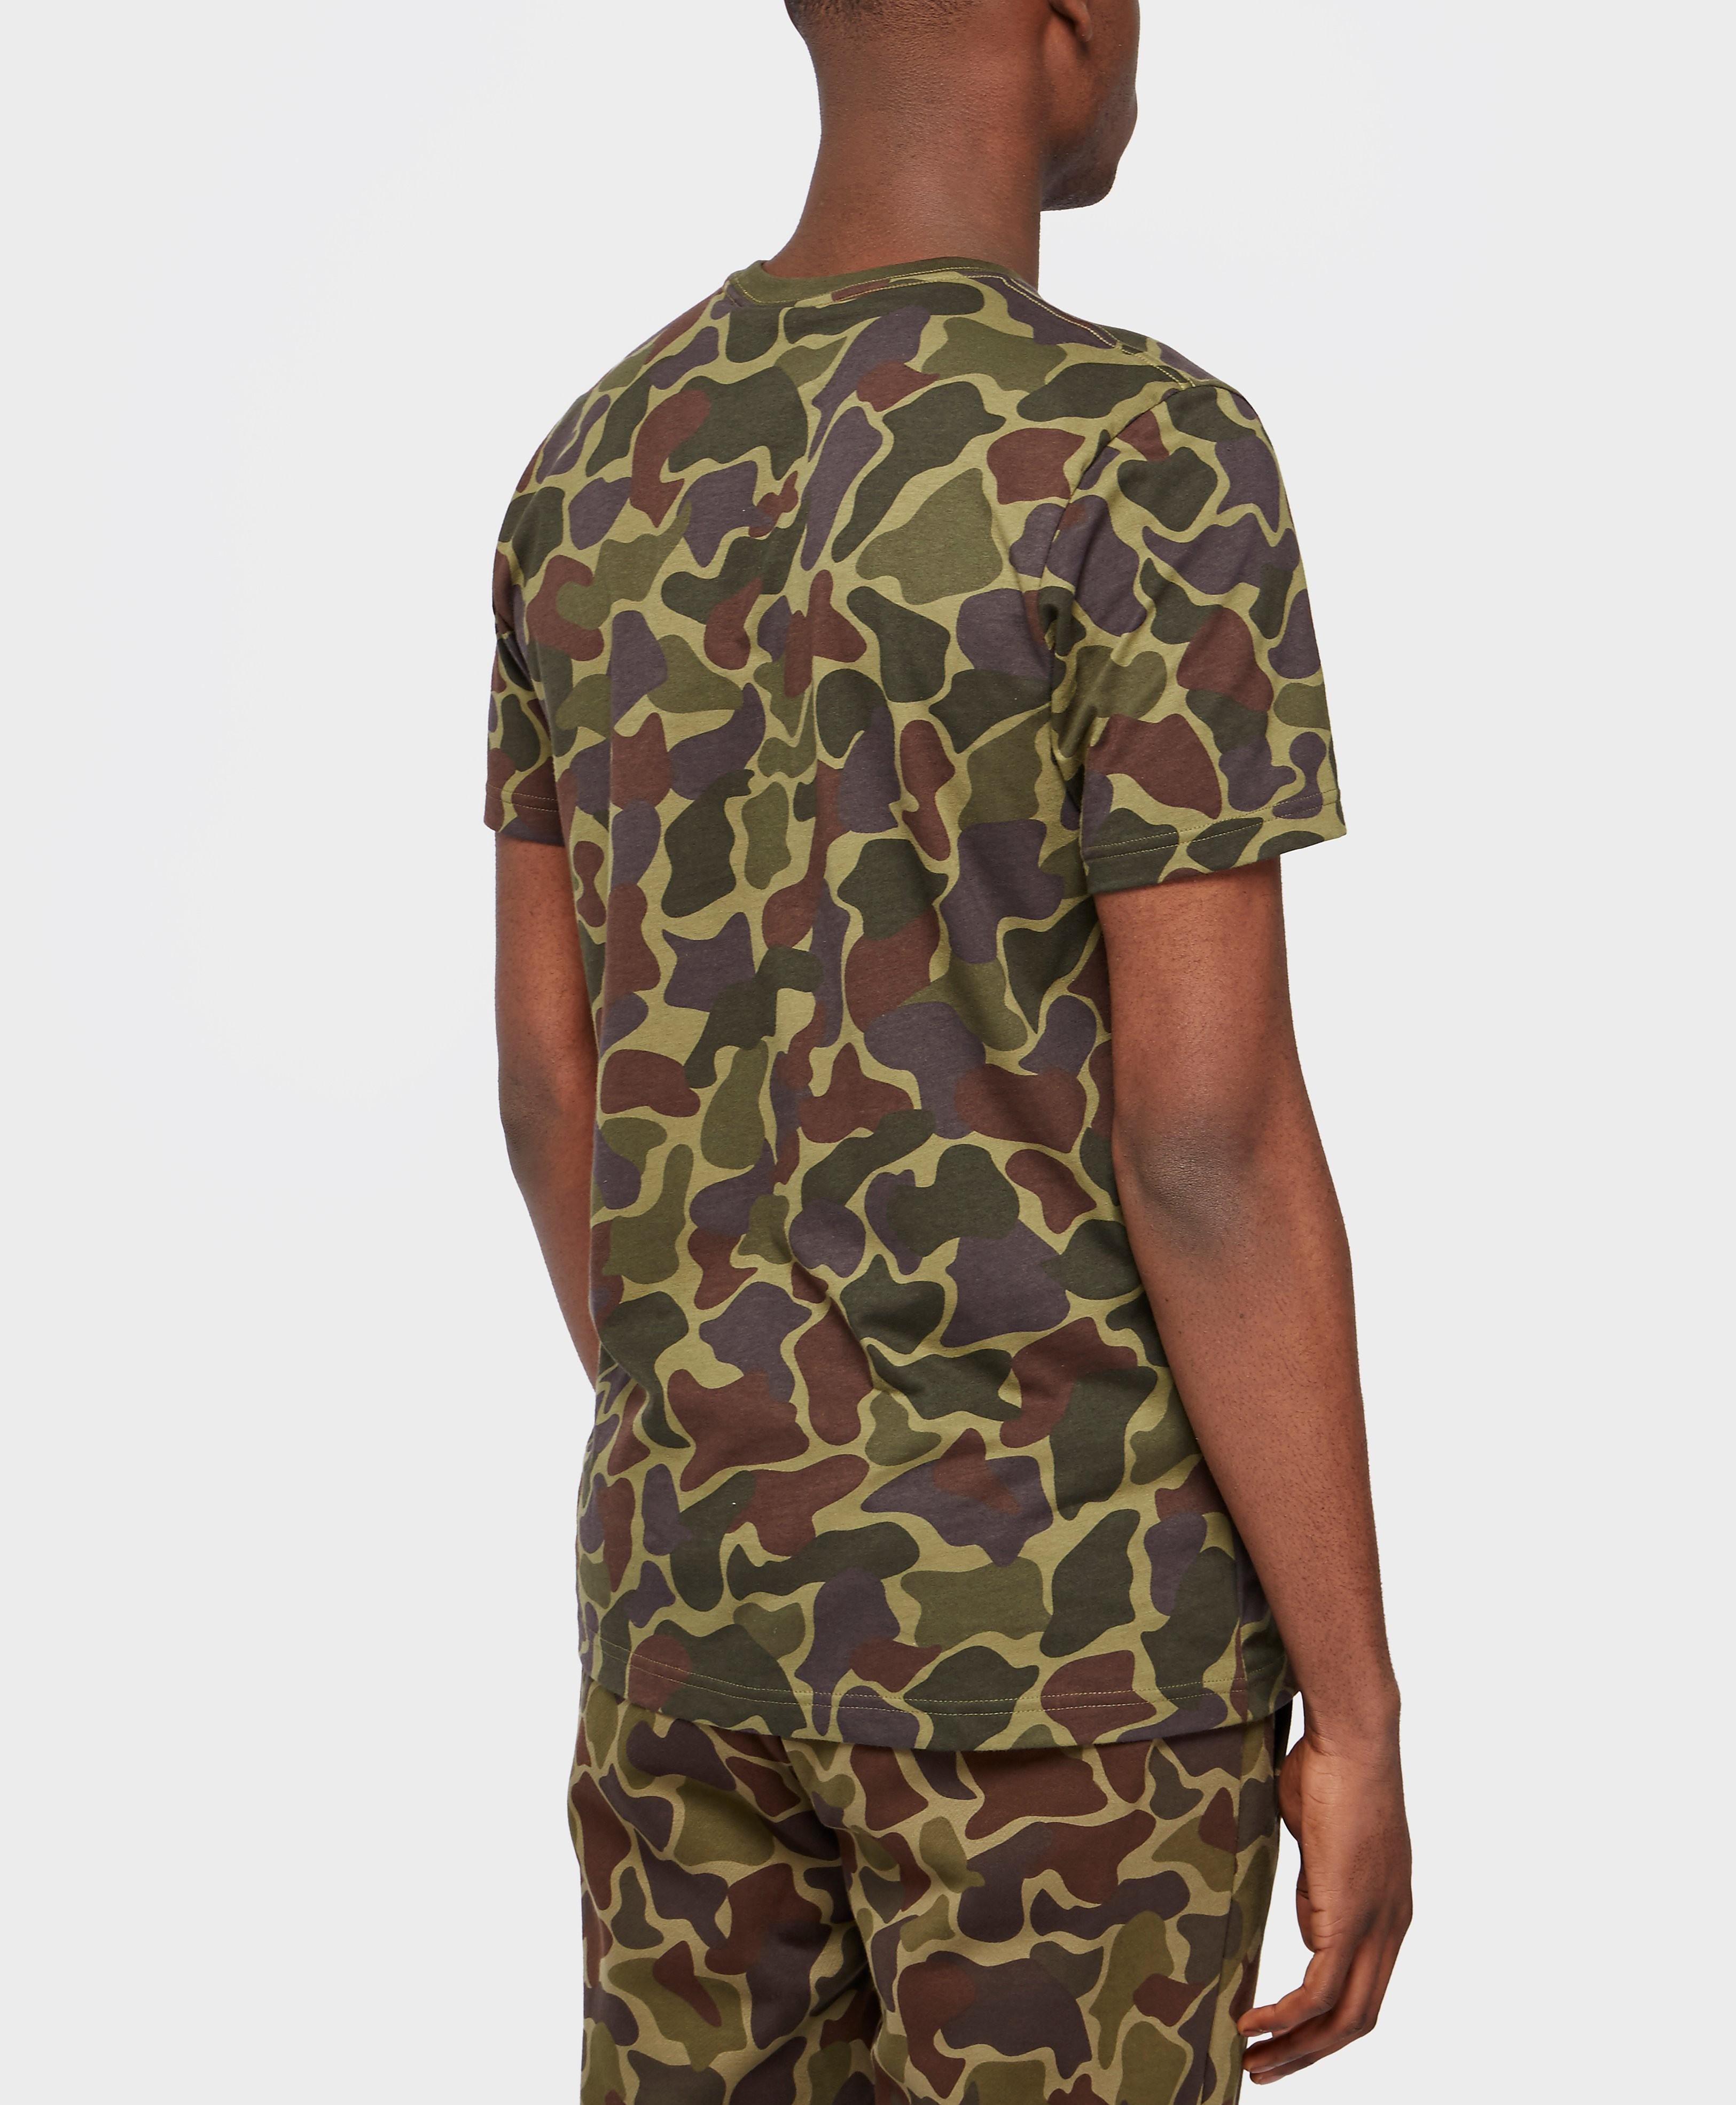 adidas Originals Camouflage T-Shirt